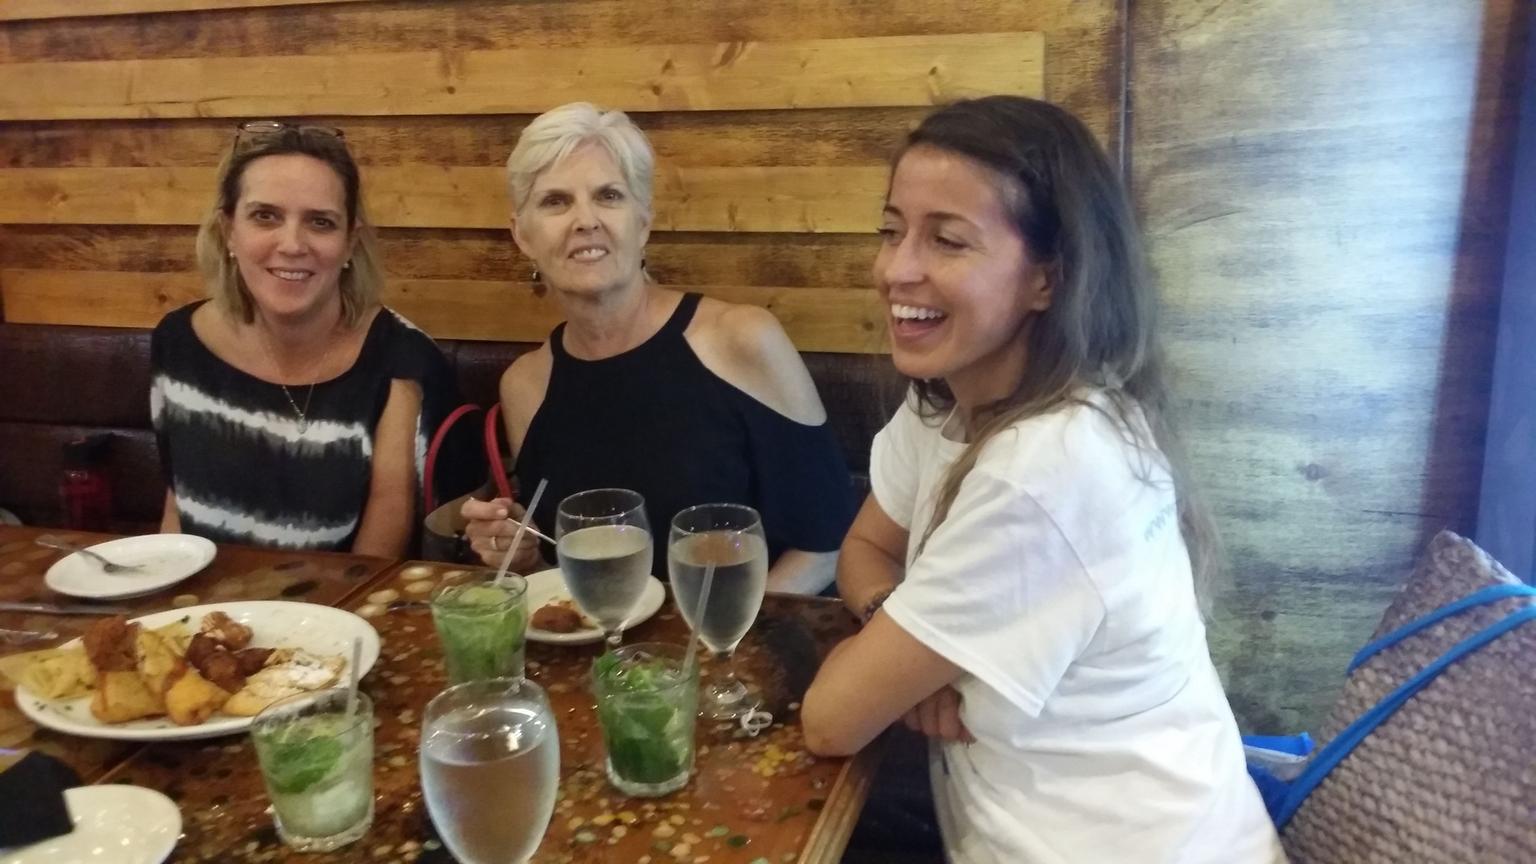 MORE PHOTOS, A Taste of South Beach Food Tour